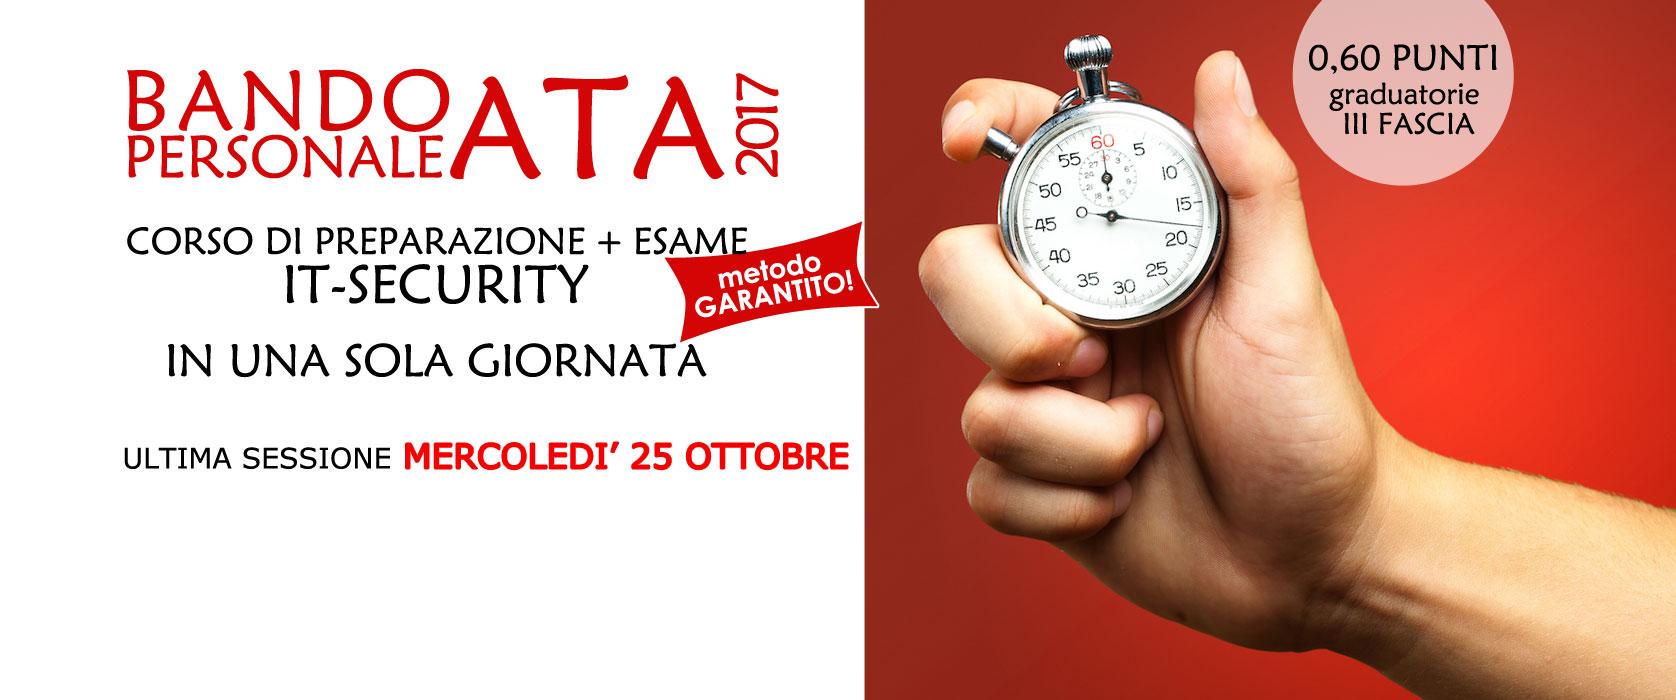 grid-slide-home-website-ATA_ultima-sessione_ok